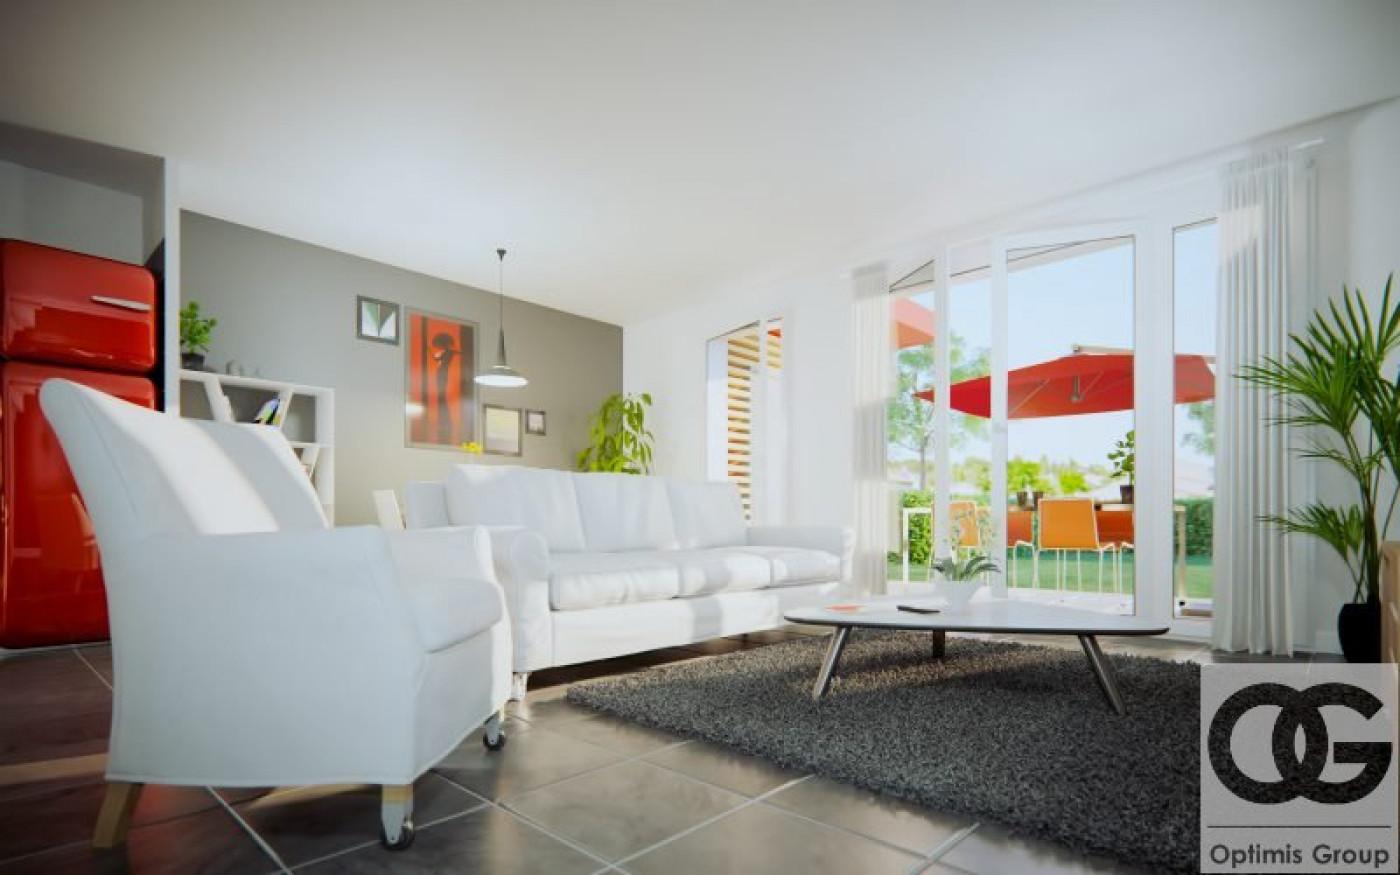 A vendre Biarritz 640221885 Optimis group